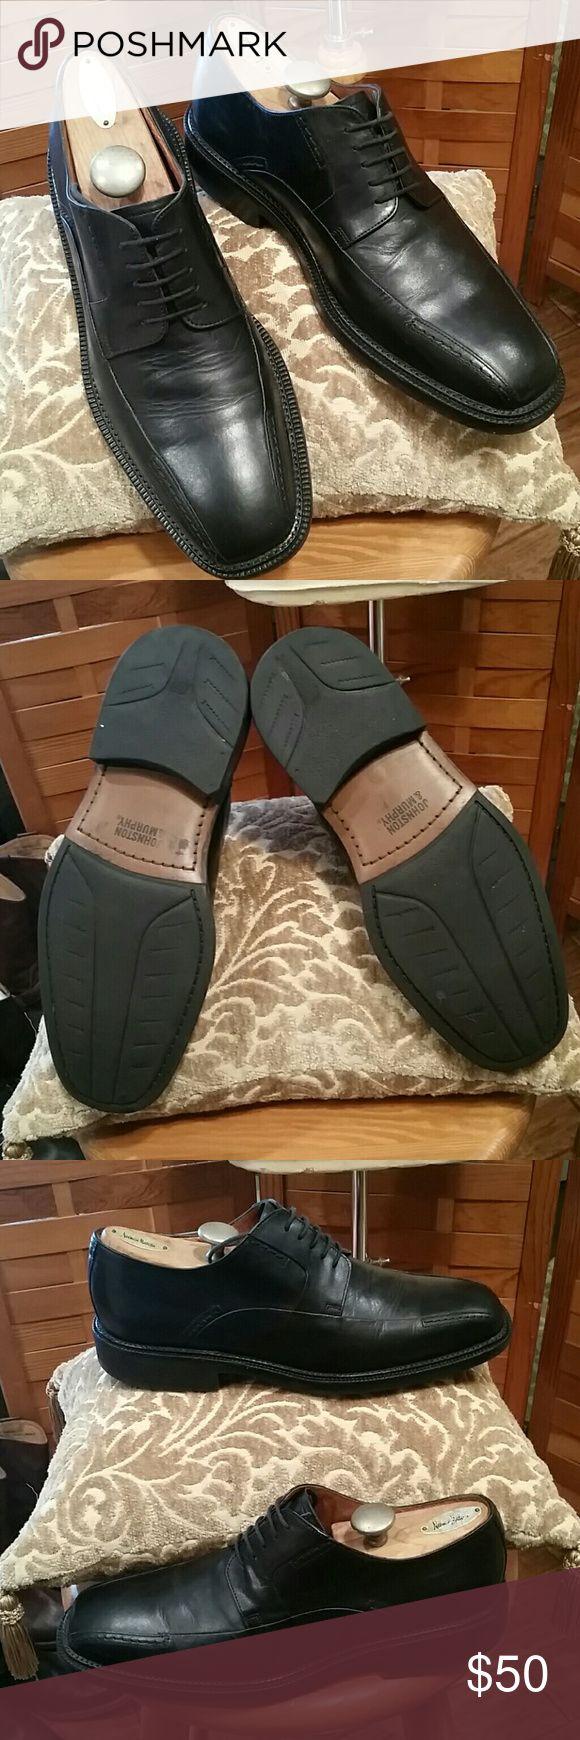 MEN'S JOHNSTON & MURPHY BLACK  OXFORD SZ 9.5 EUC Very nice men's leather Johnston & Murphy oxford lightly worn practically new condition!;sz 9.5 Johnston & Murphy Shoes Oxfords & Derbys